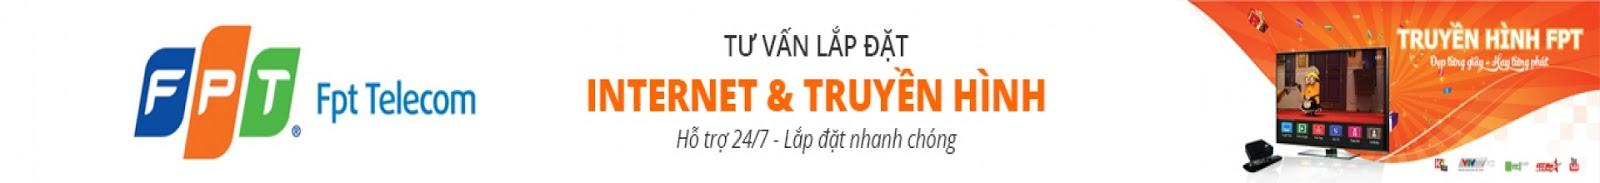 lap-dat-internet